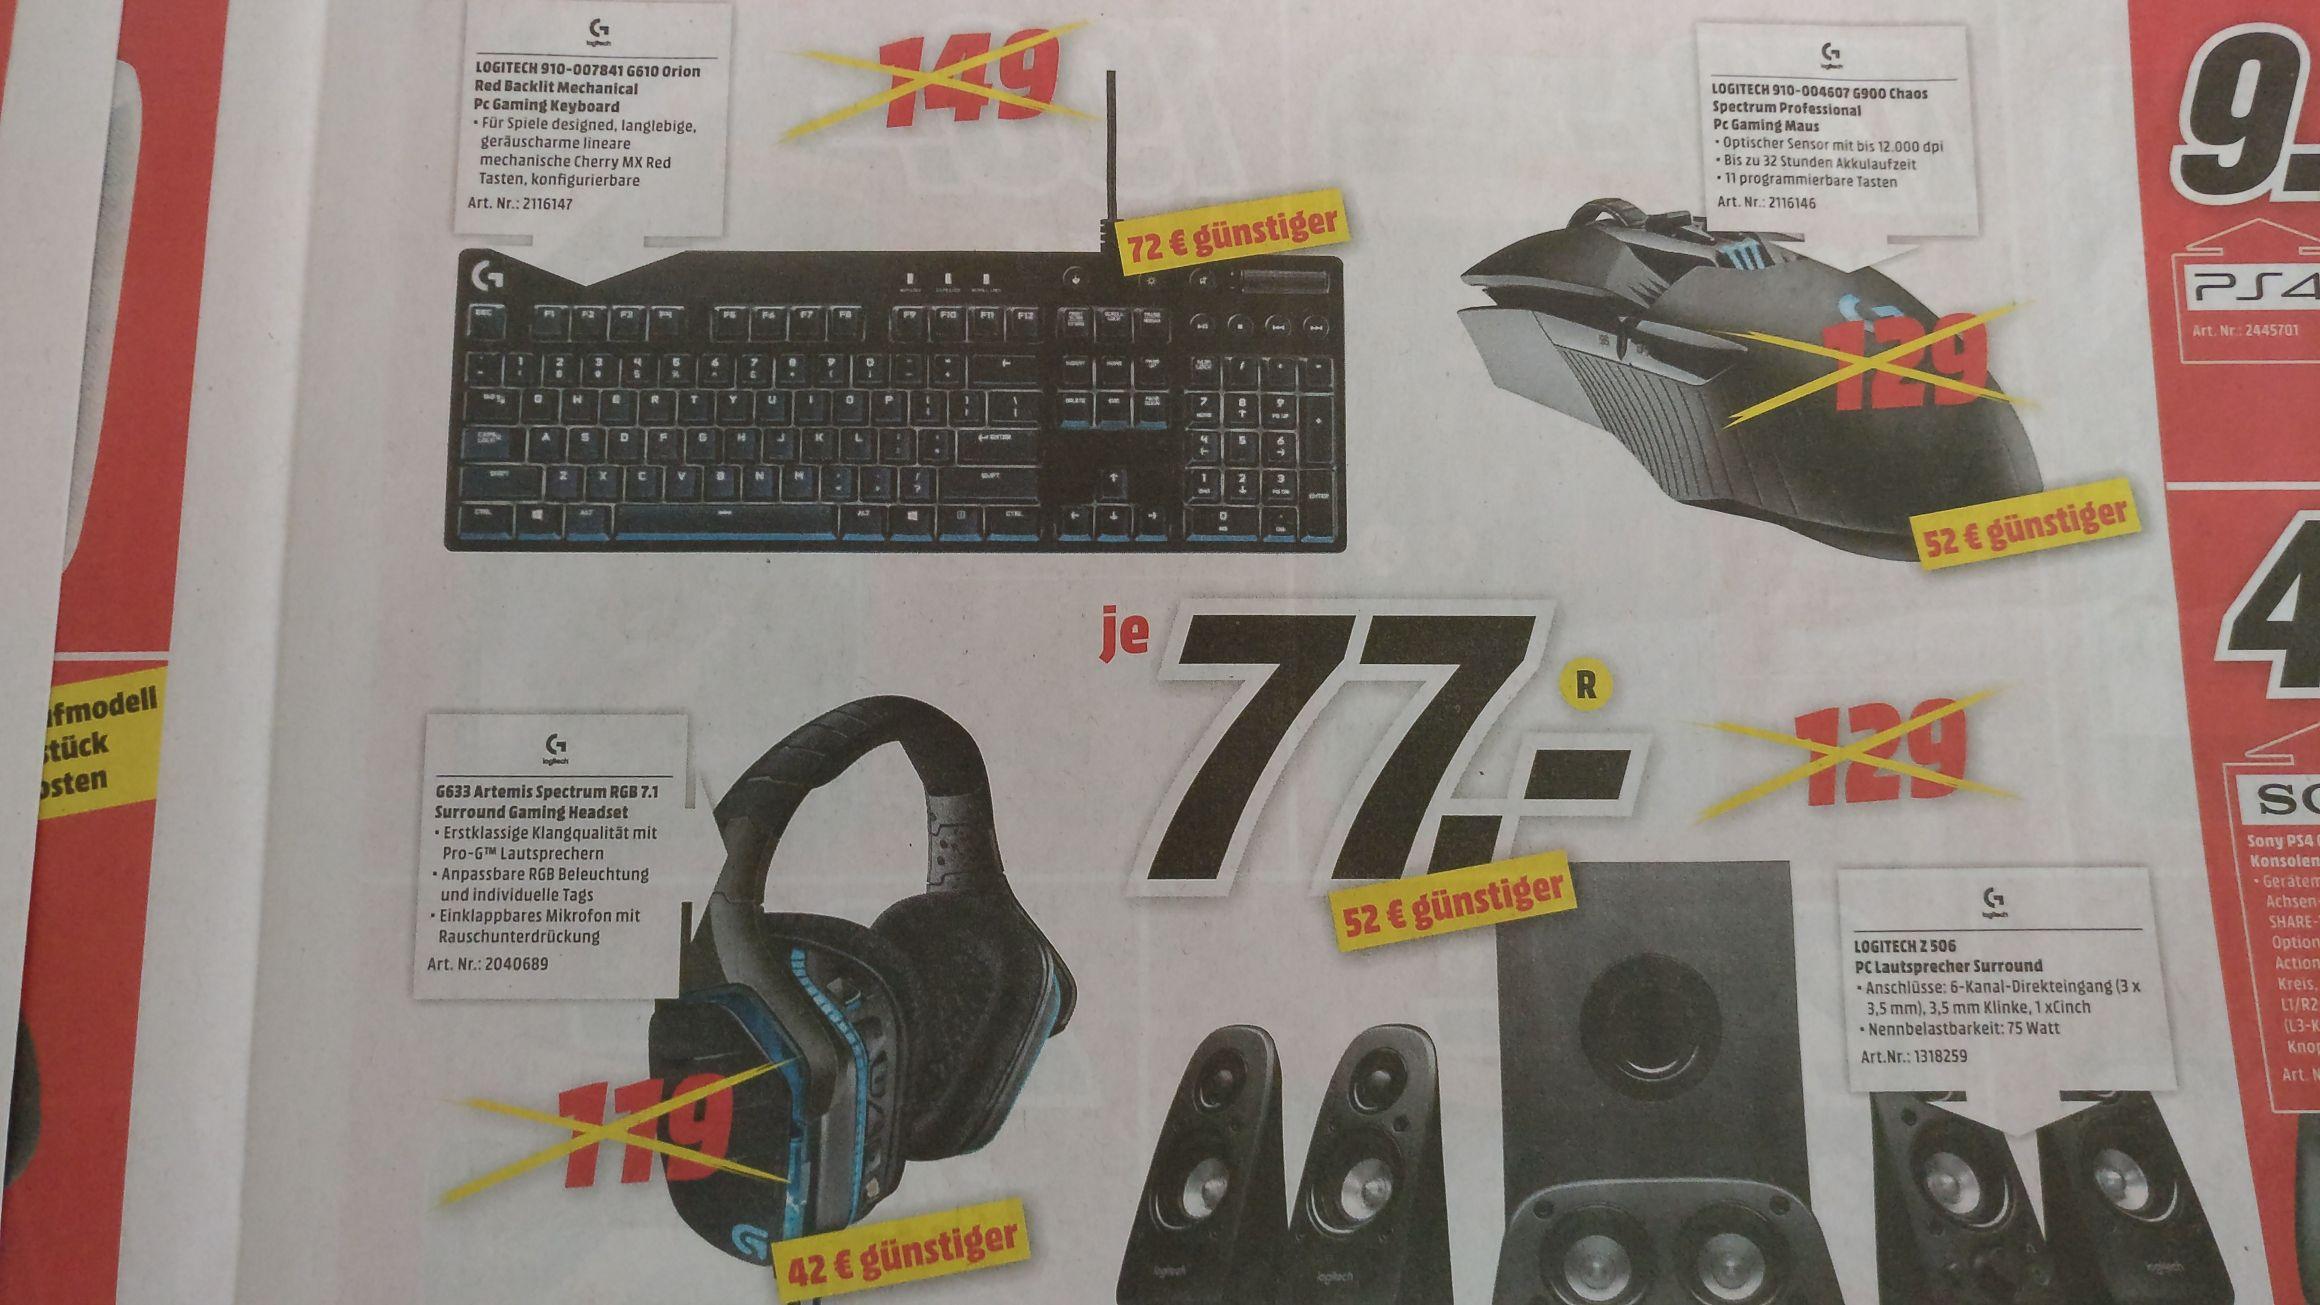 [Lokal Dorsten] Media Markt Logitech 900 Chaos Spectrum, G633 Artemis Spectrum RGB 7.1 je 77€